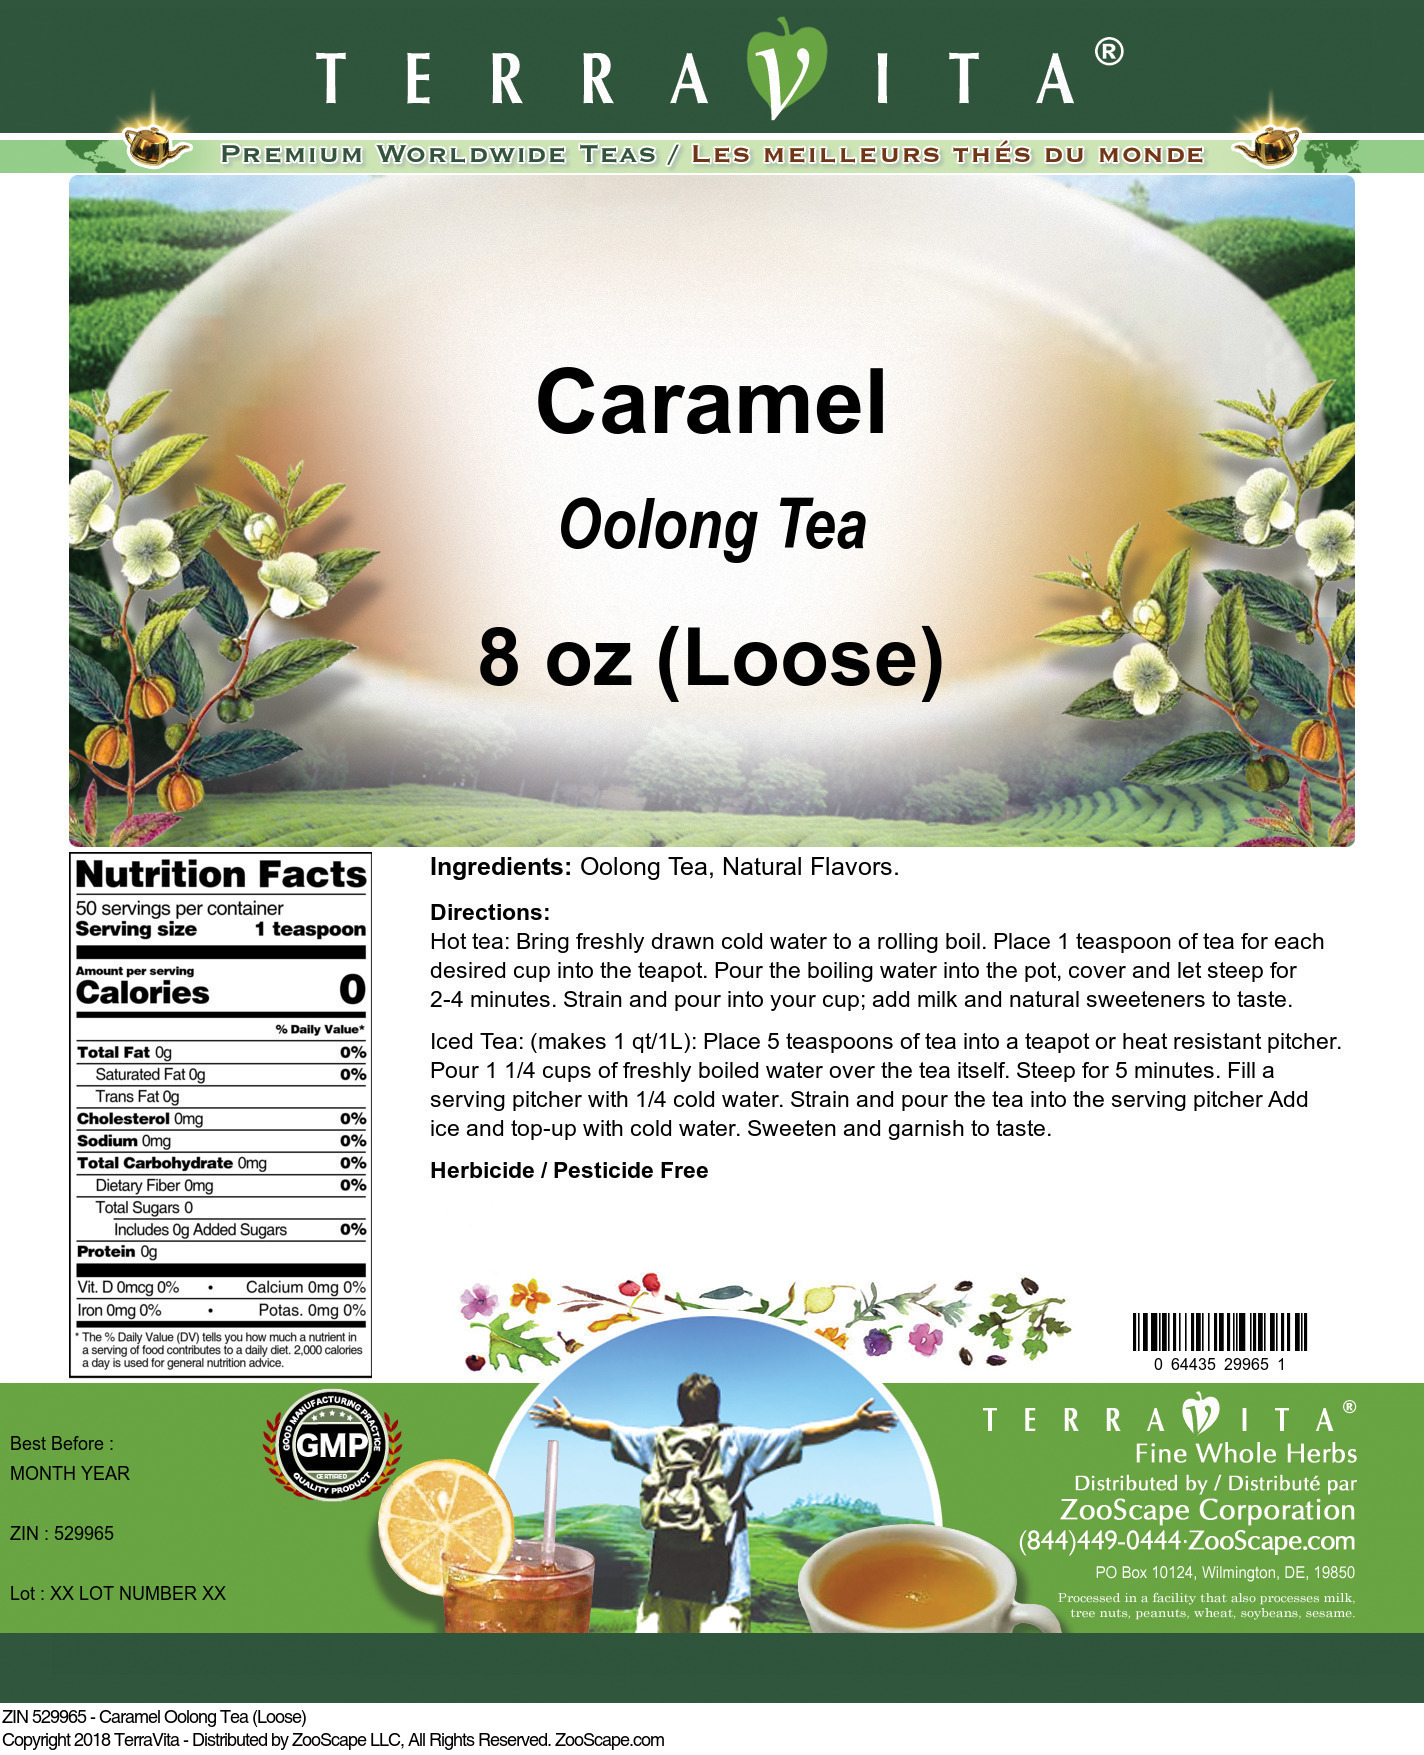 Caramel Oolong Tea (Loose)